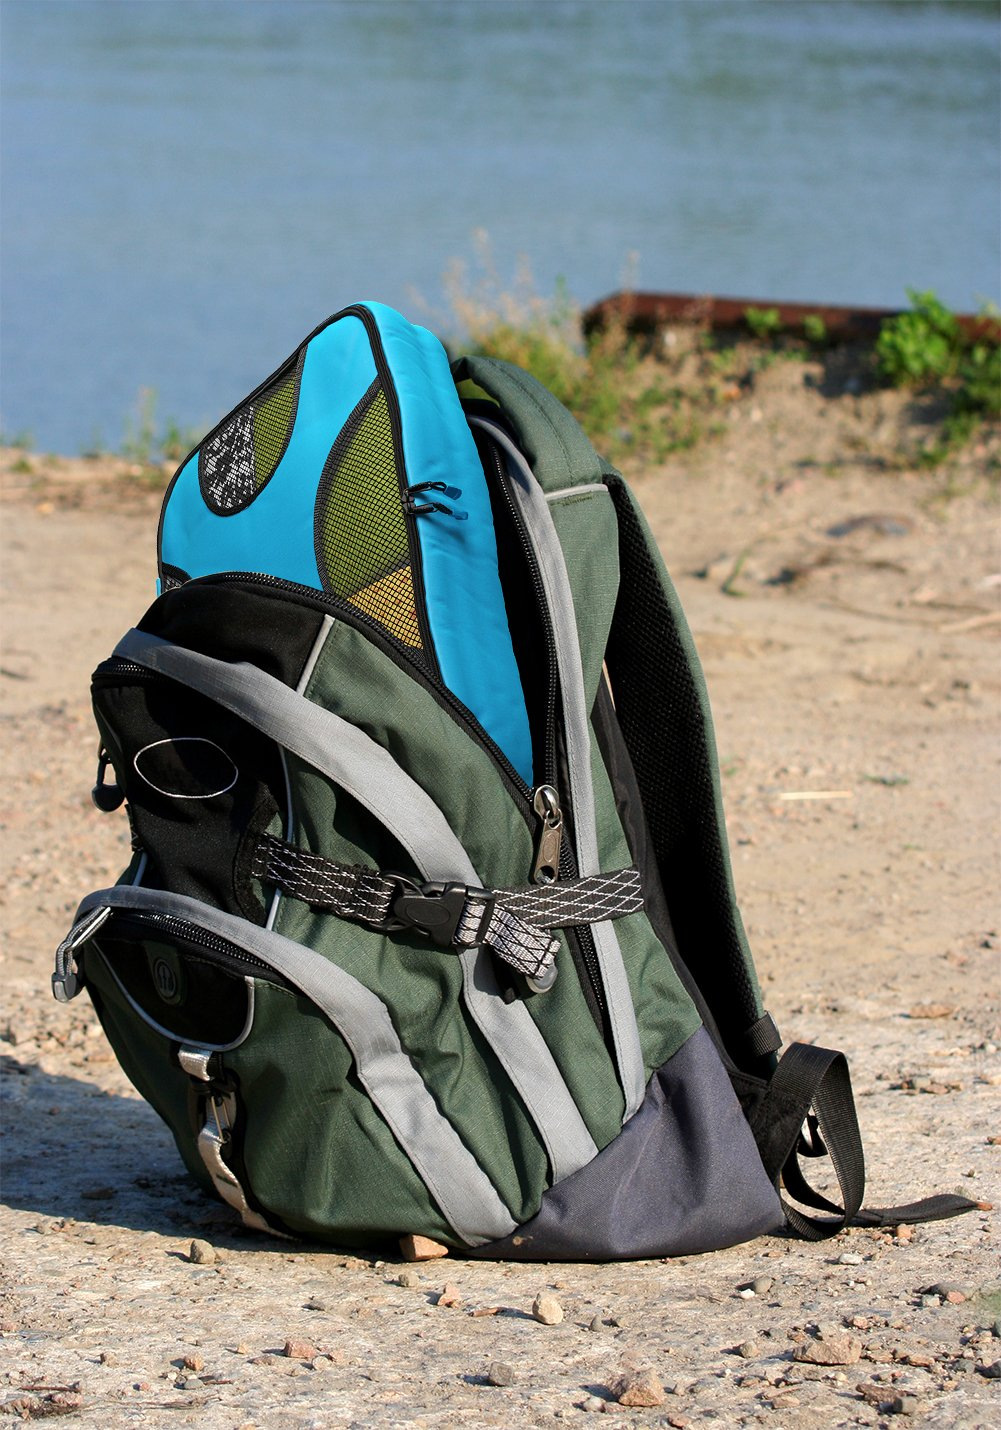 Shacke Pak 5 Set Packing Cubes Medium/Small – Luggage Packing Travel Organizers